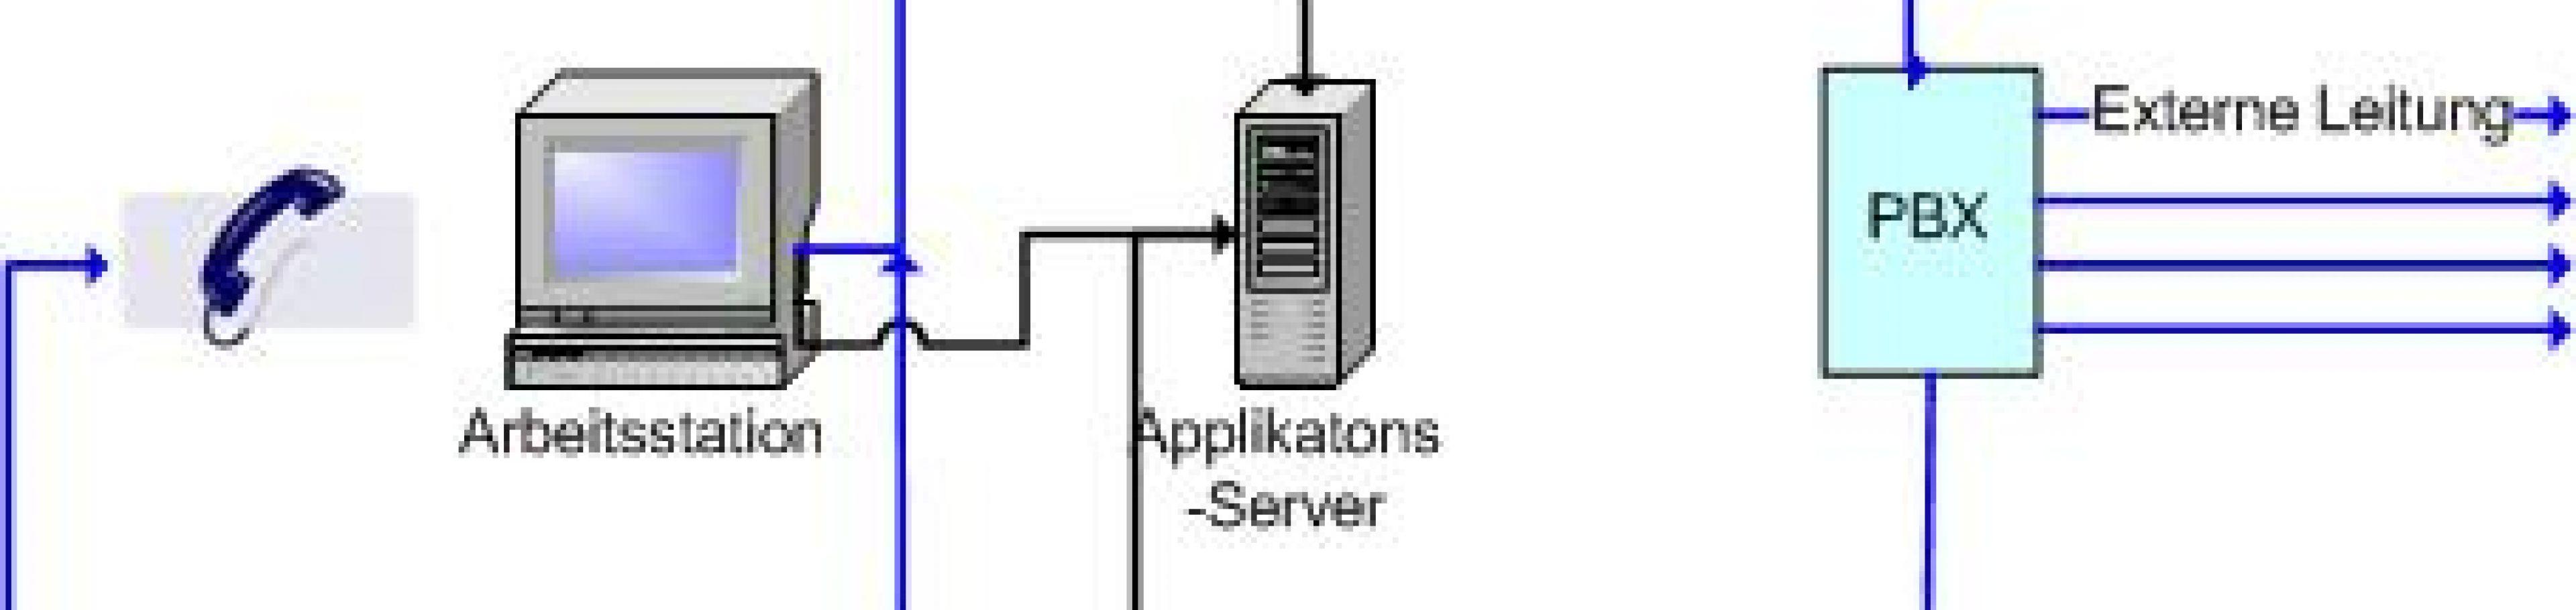 Anwahlverfahren im Outbound Callcenter: Powerdial, Predictive Dialer